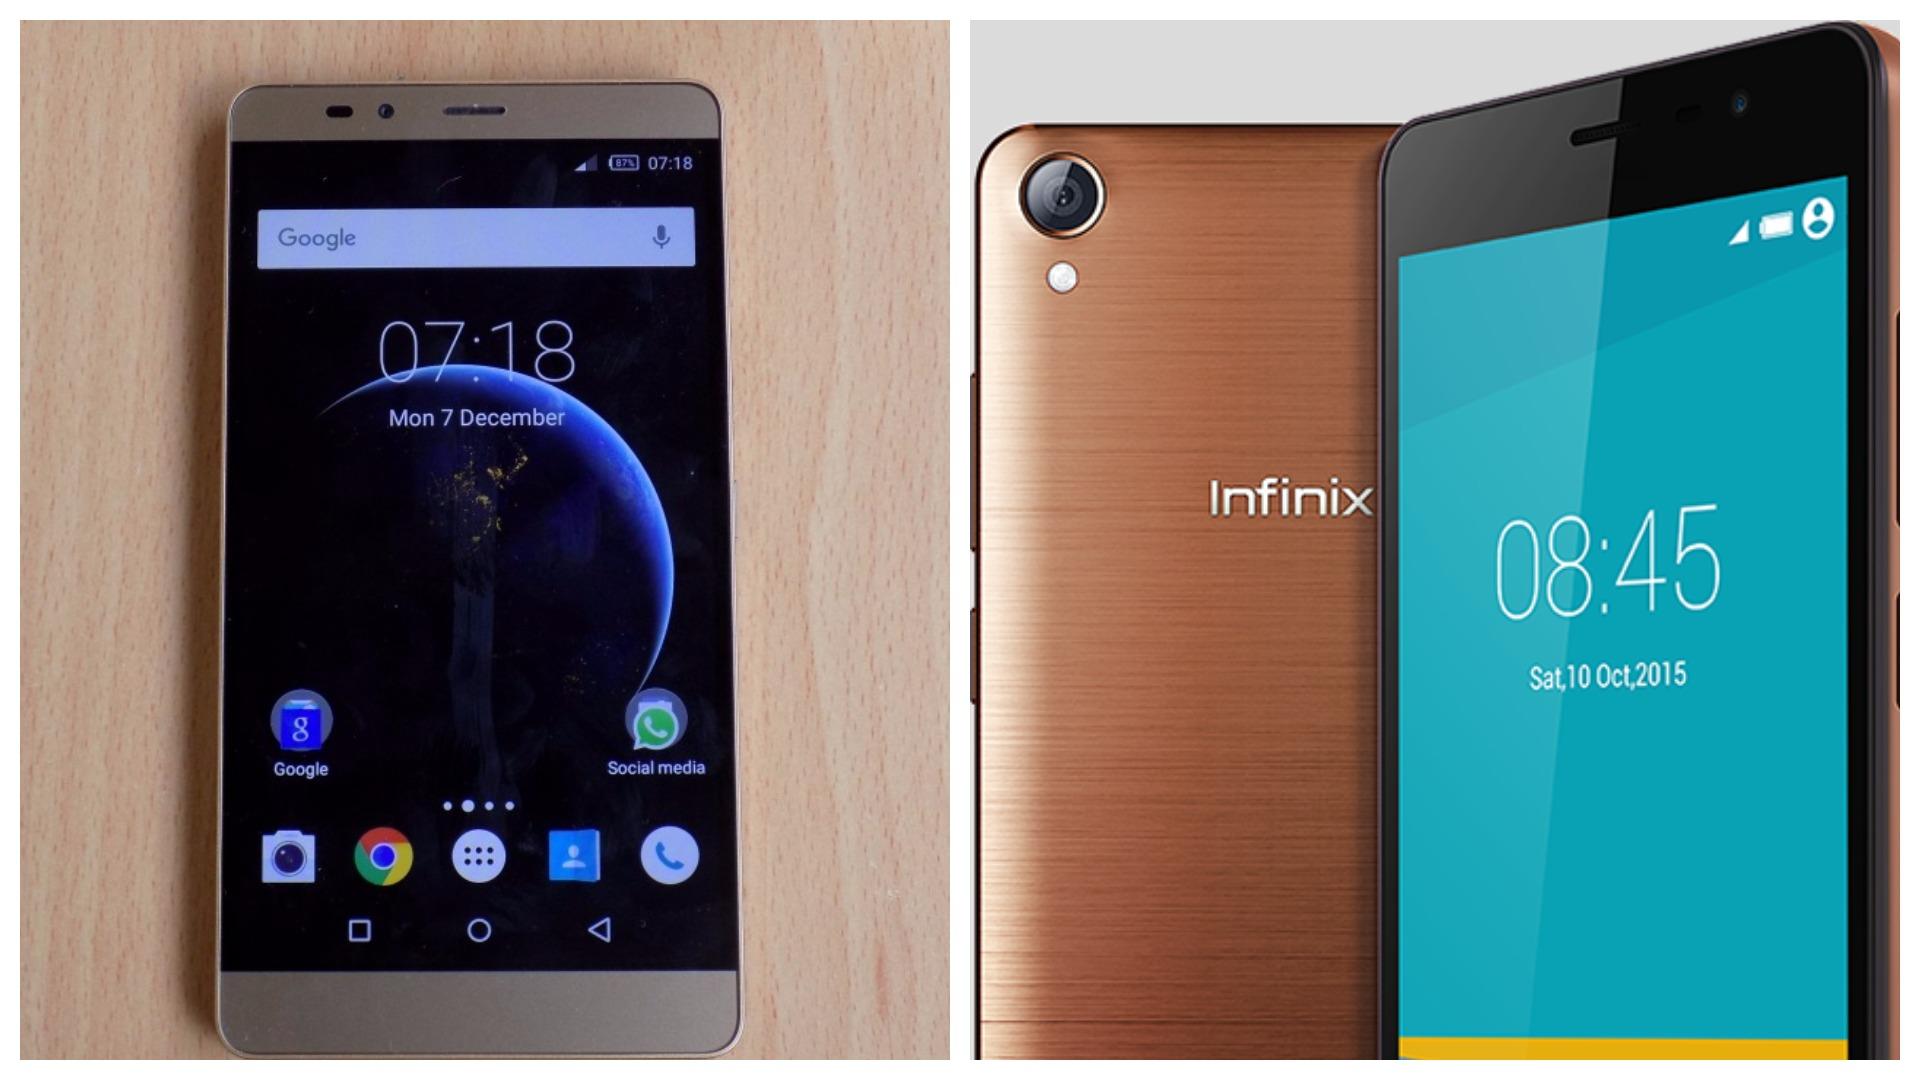 Off on Infinix Note 2 Vs Infinix Hot Note Specs showdown 0 676